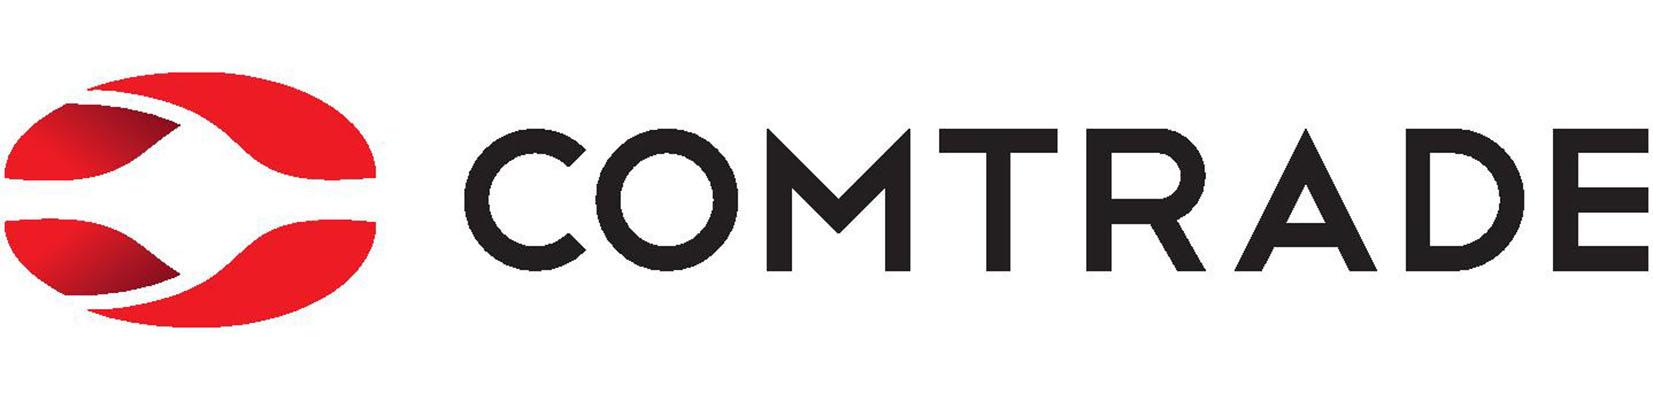 http://www.3kproduction.rs/wp-content/uploads/2017/09/comtrade_logo.jpg